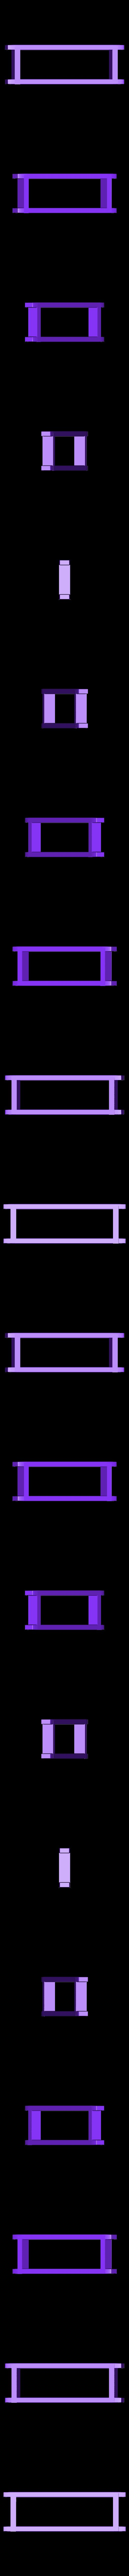 QM_Marble_Run_Cube_Binder.stl Download free STL file QM Marble Run • 3D printer design, quirkymojo